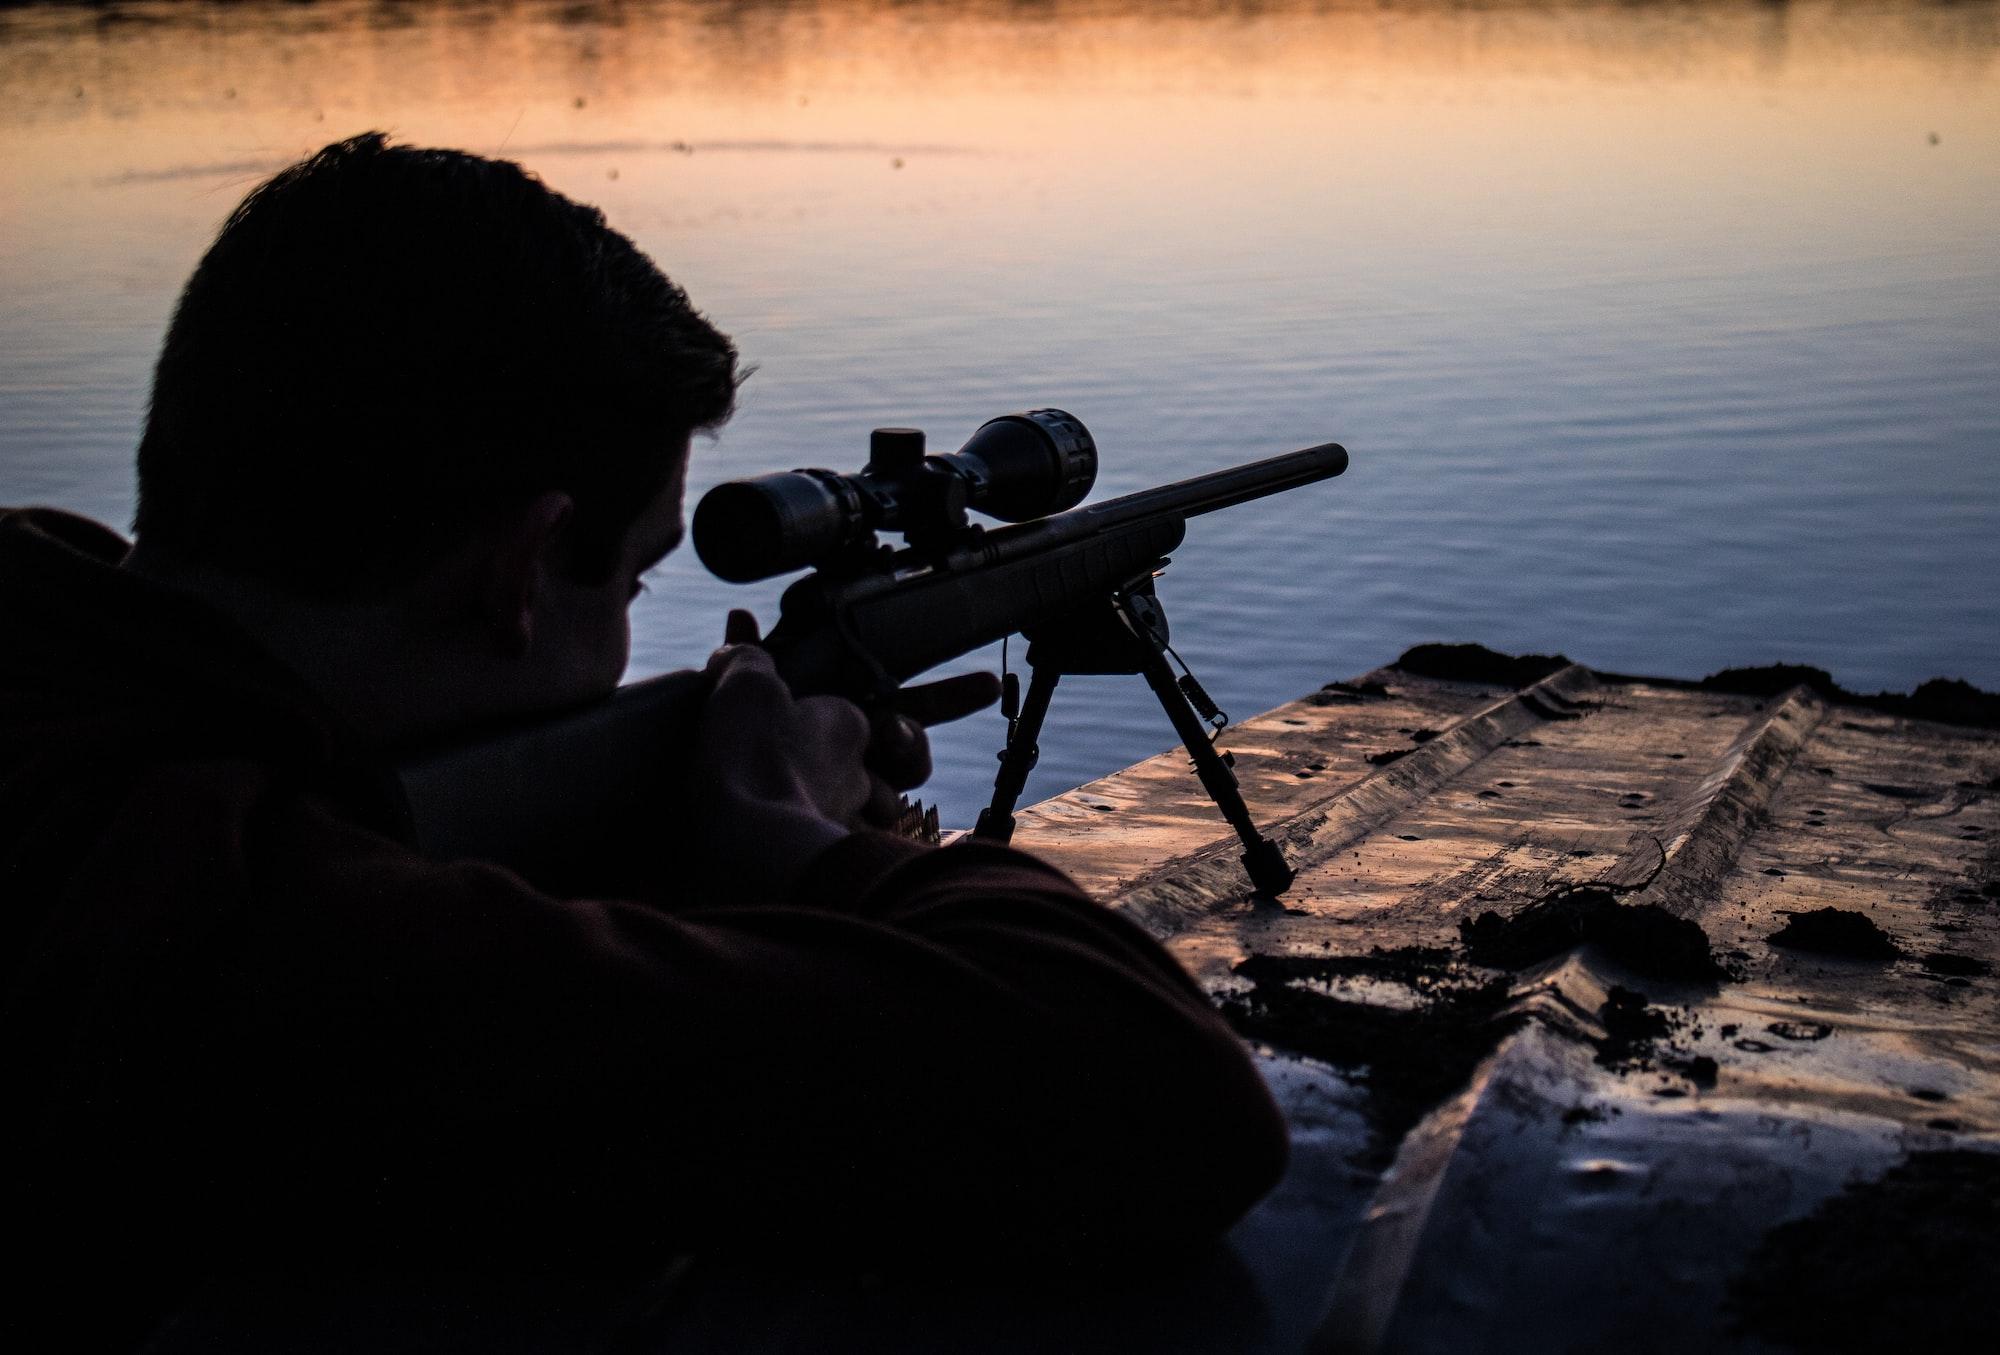 Taking aim.